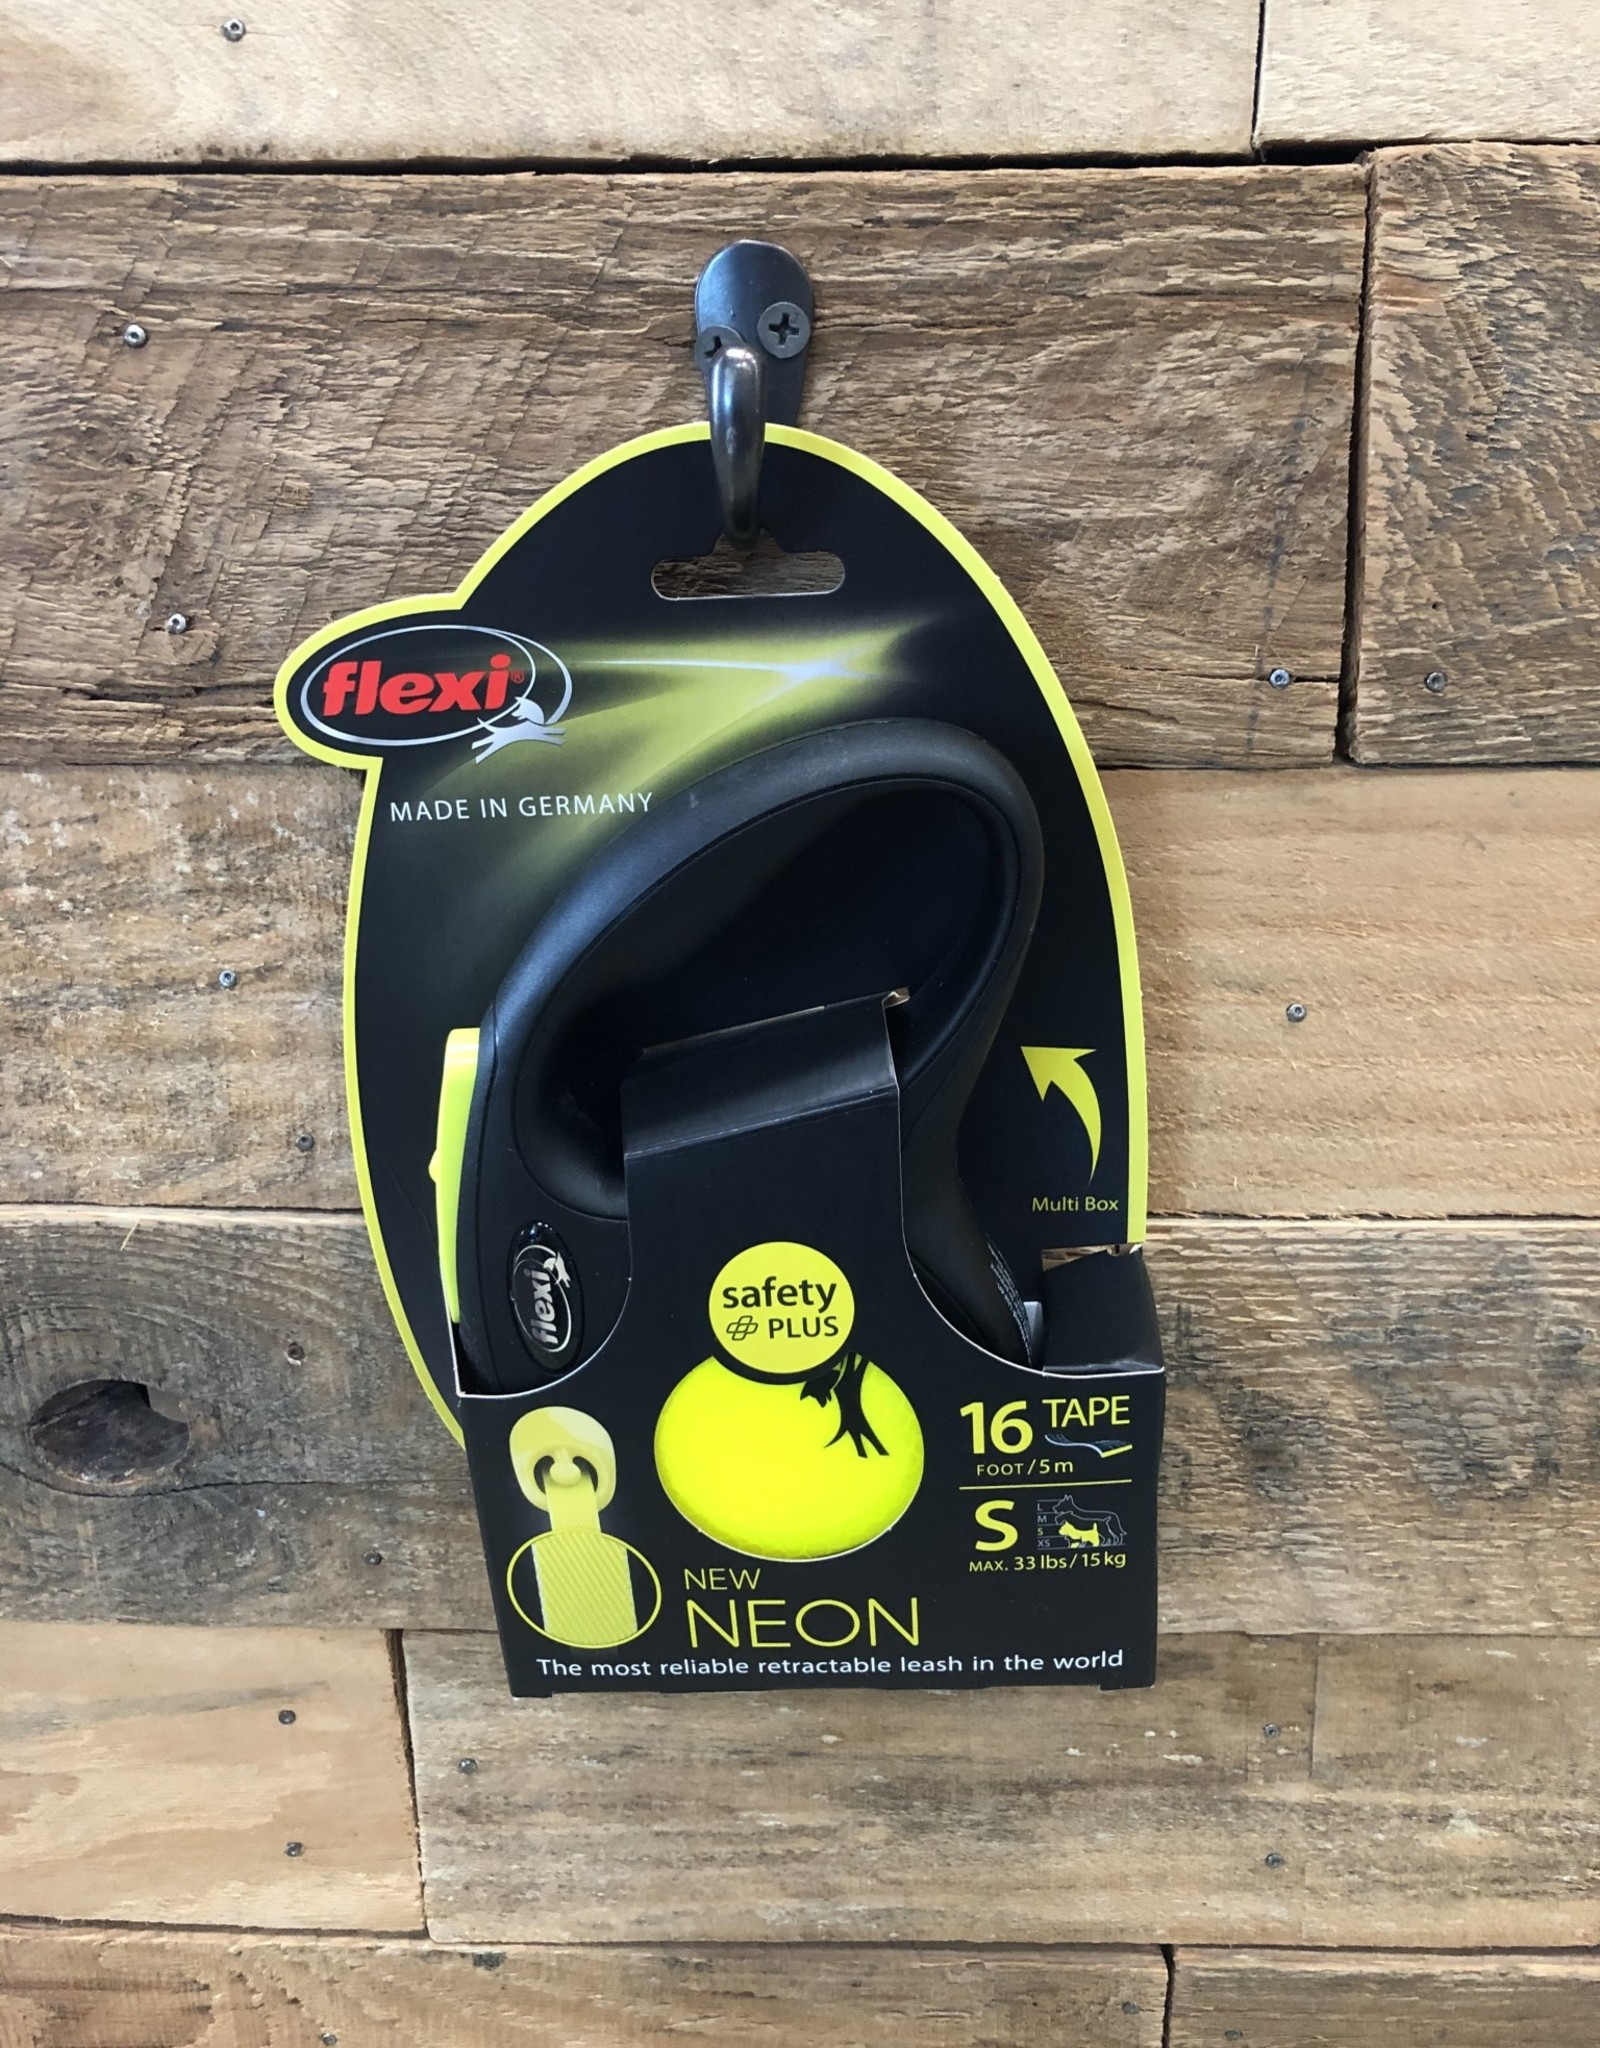 Flexi New Classic Tape Neon Yellow Reflective 16' Small